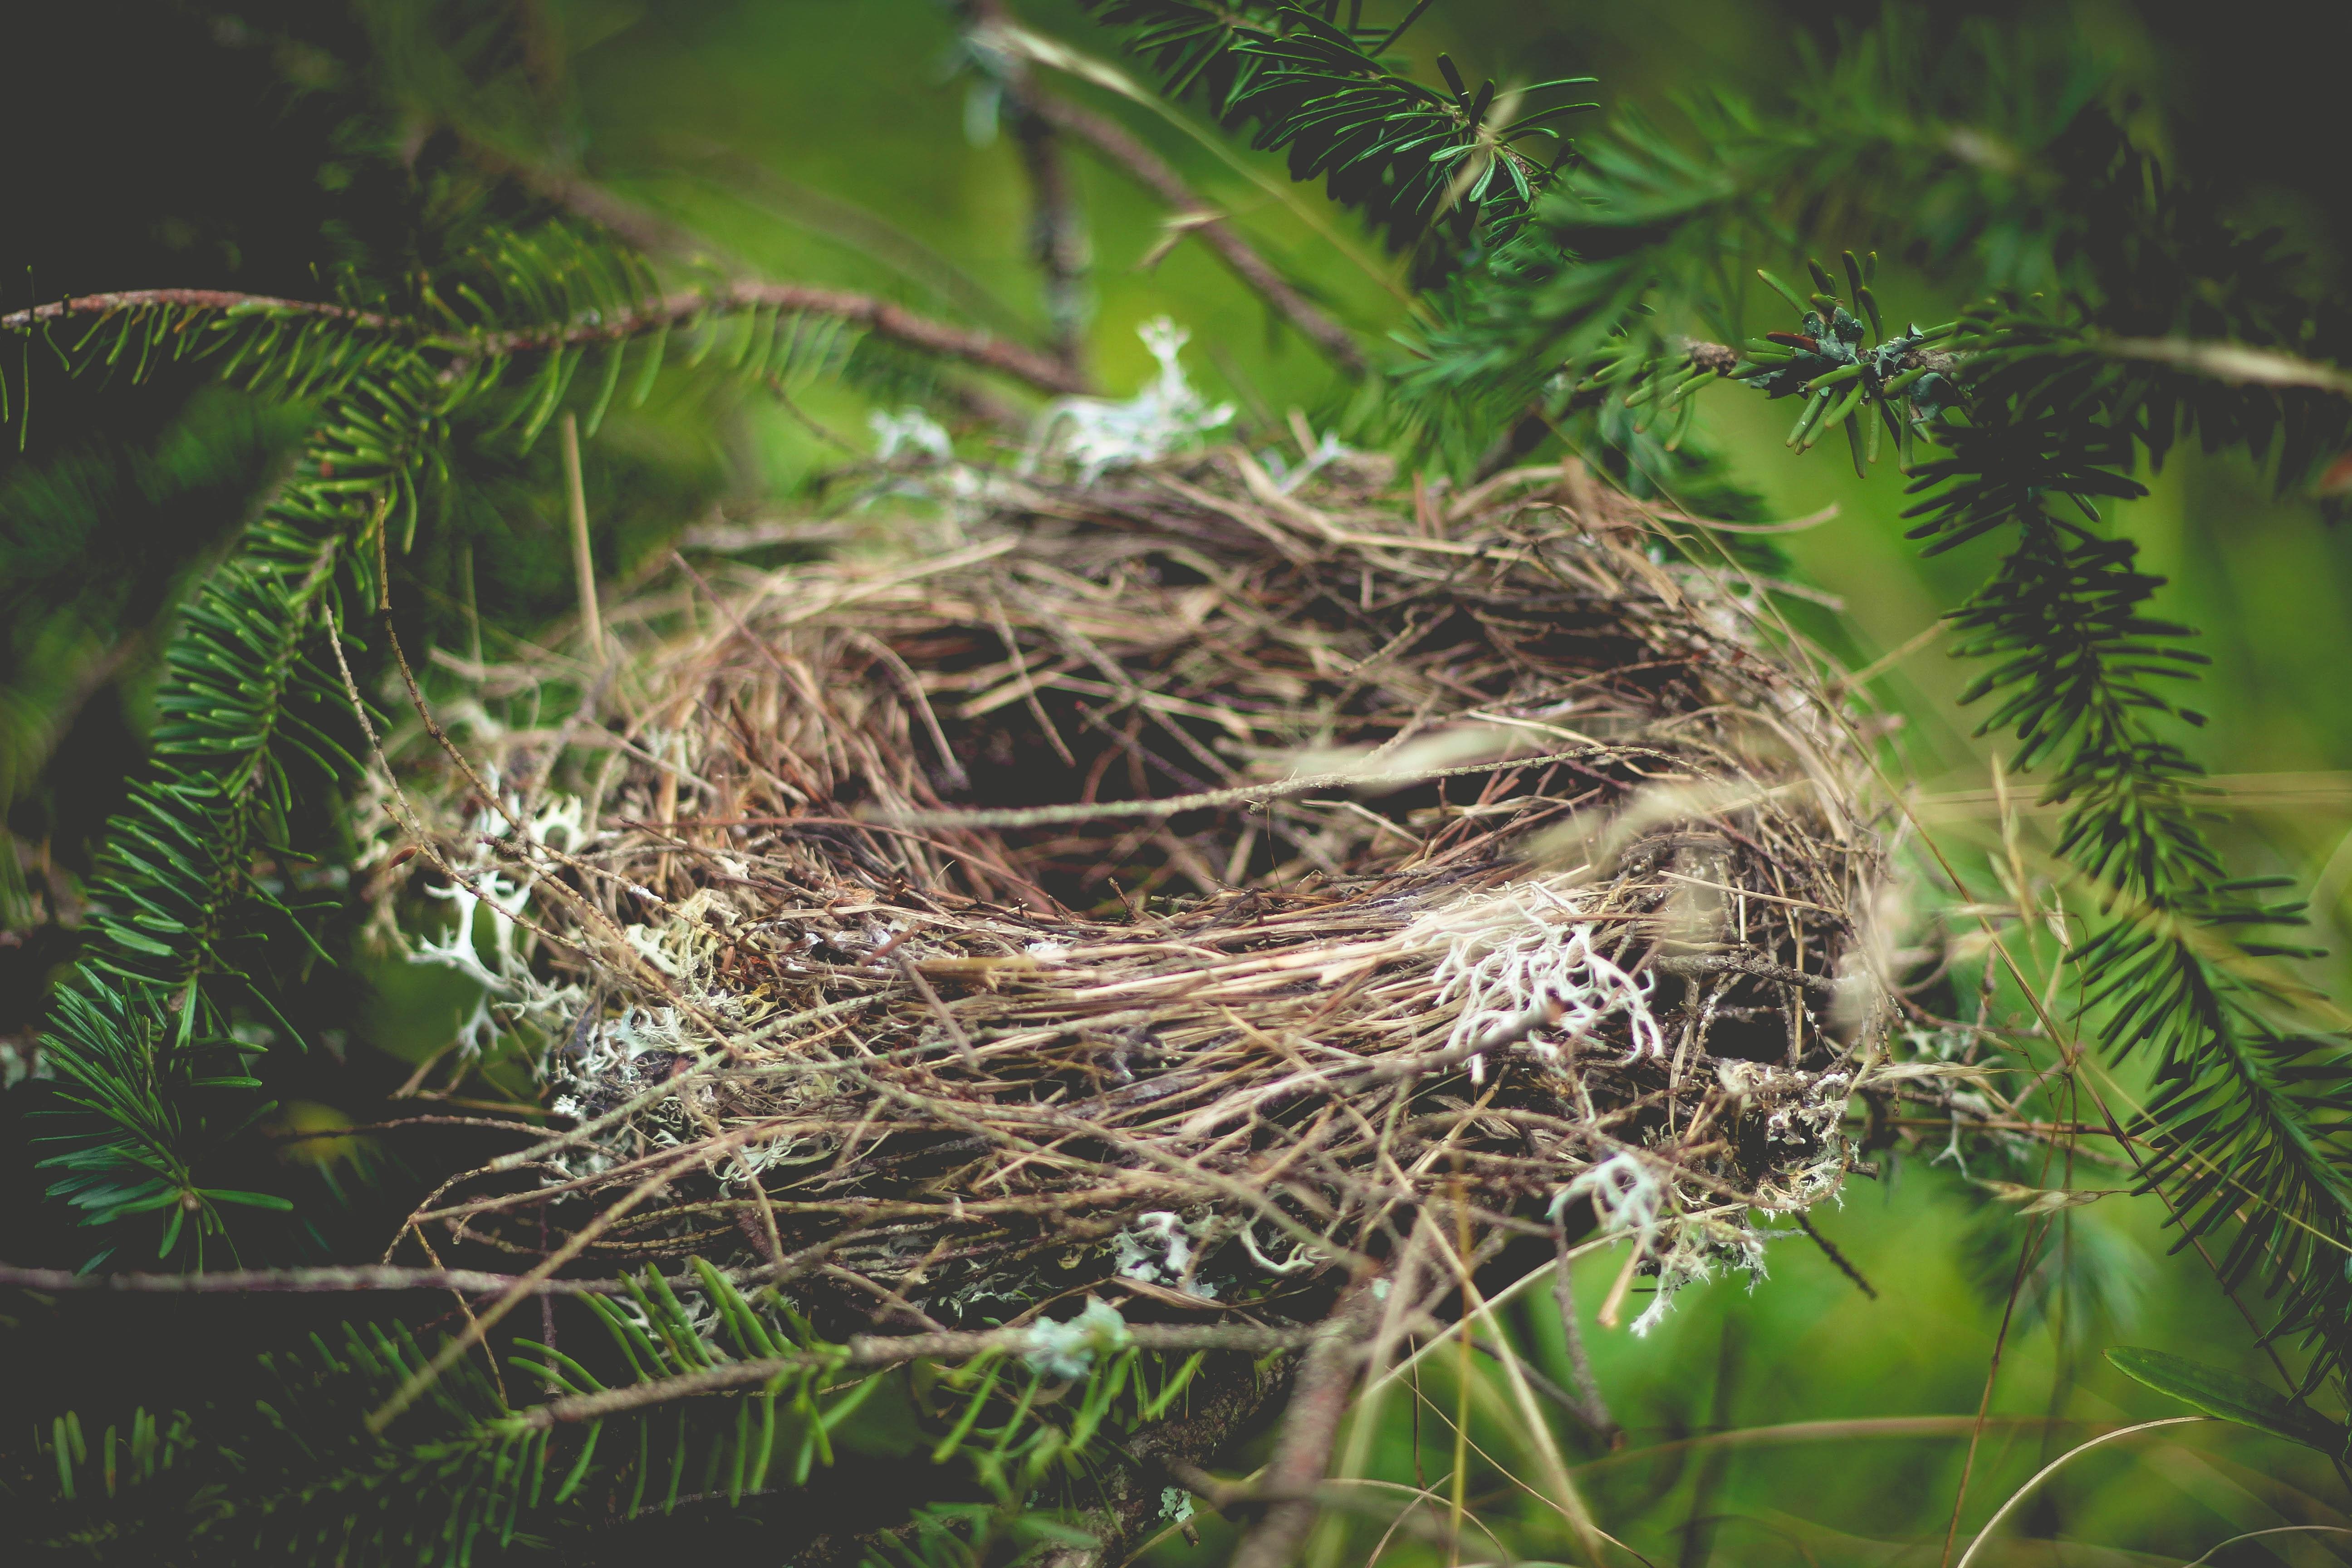 гнездо птиц фото армавира давно